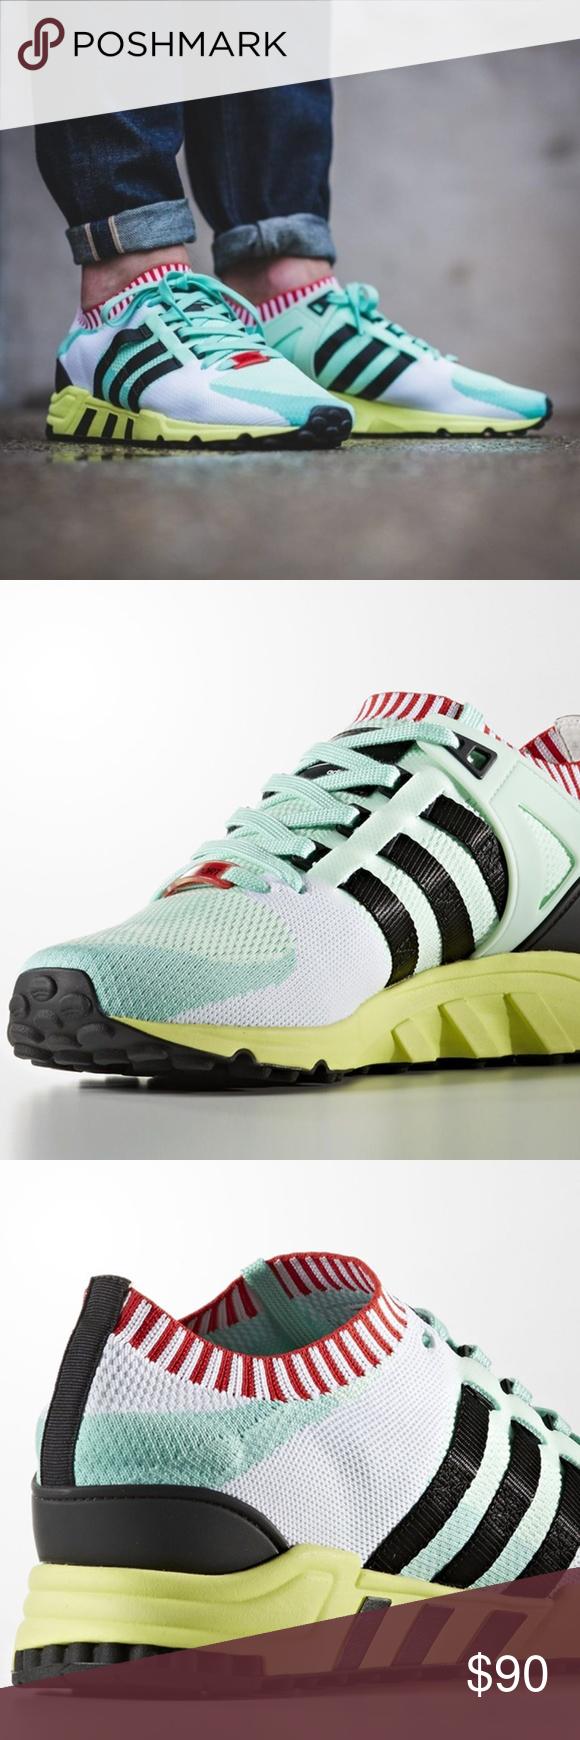 Adidas EQT Support 93 RF PK Primeknit Running Shoe Adidas ID